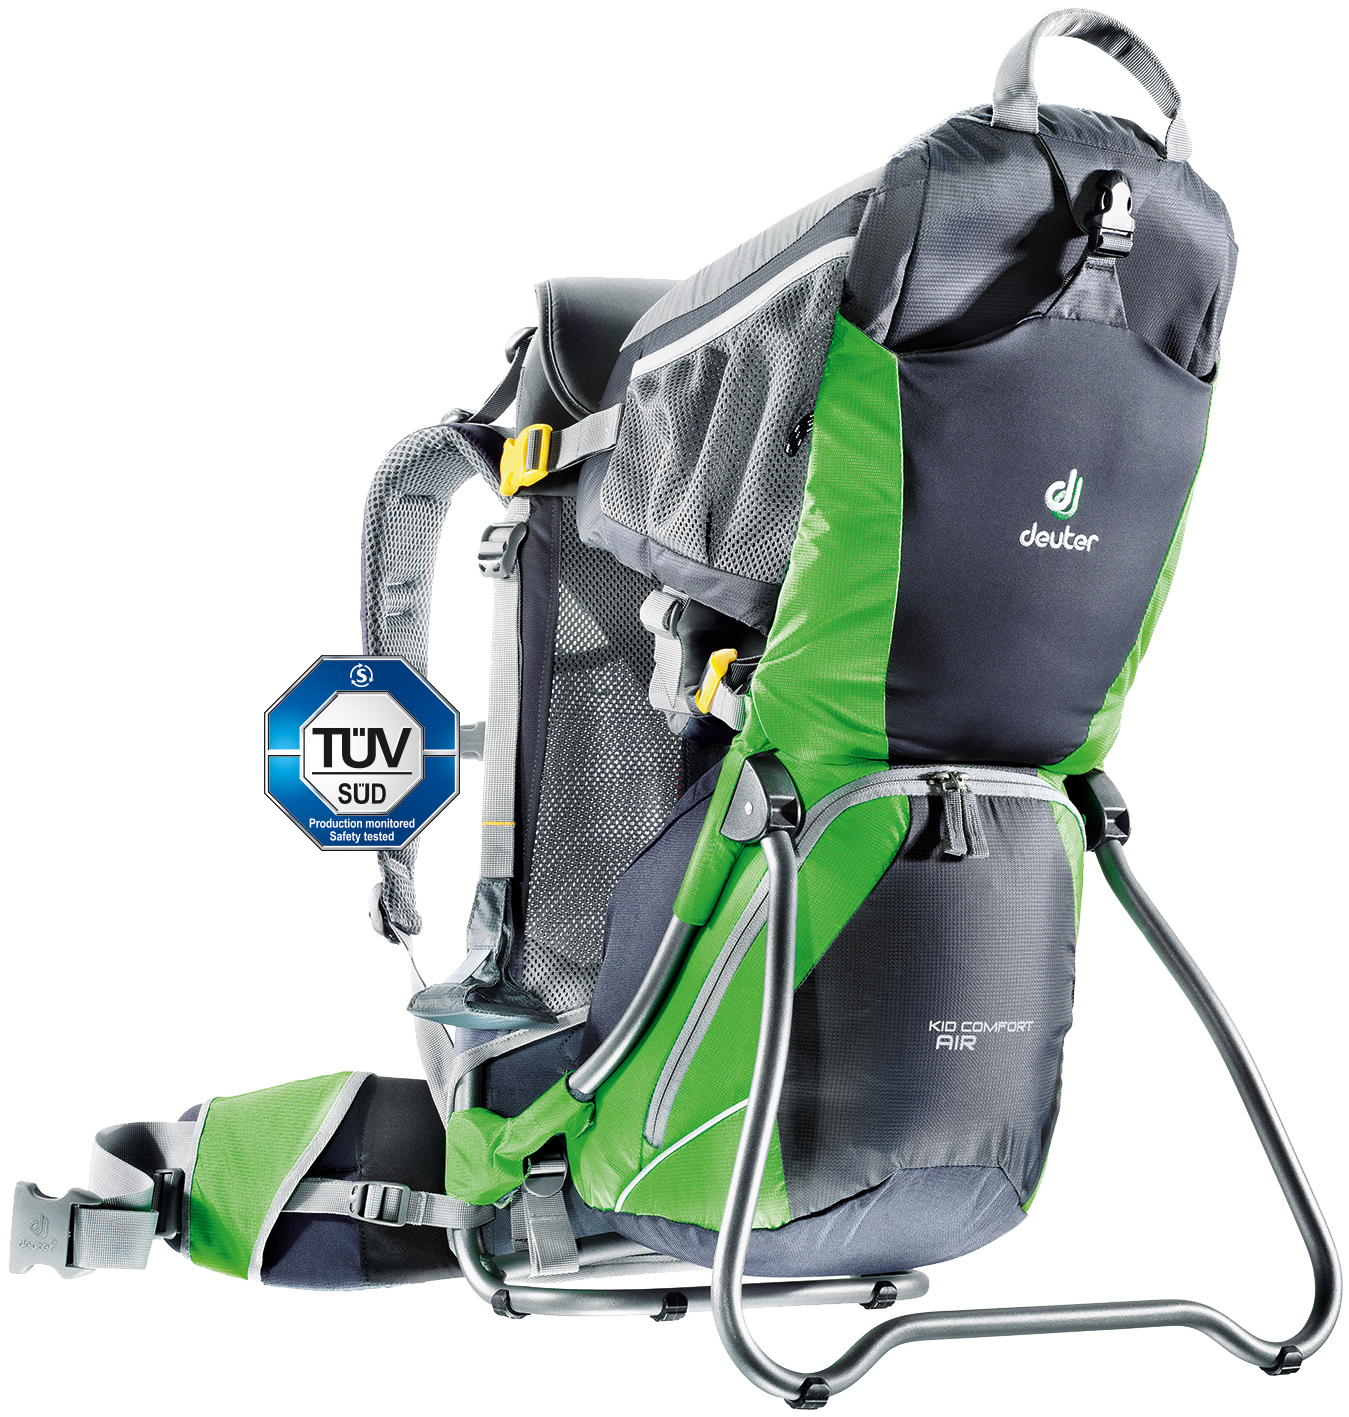 gute Qualität verrückter Preis Bestpreis Deuter Kid Comfort Air Child Carrier Backpack - Infants